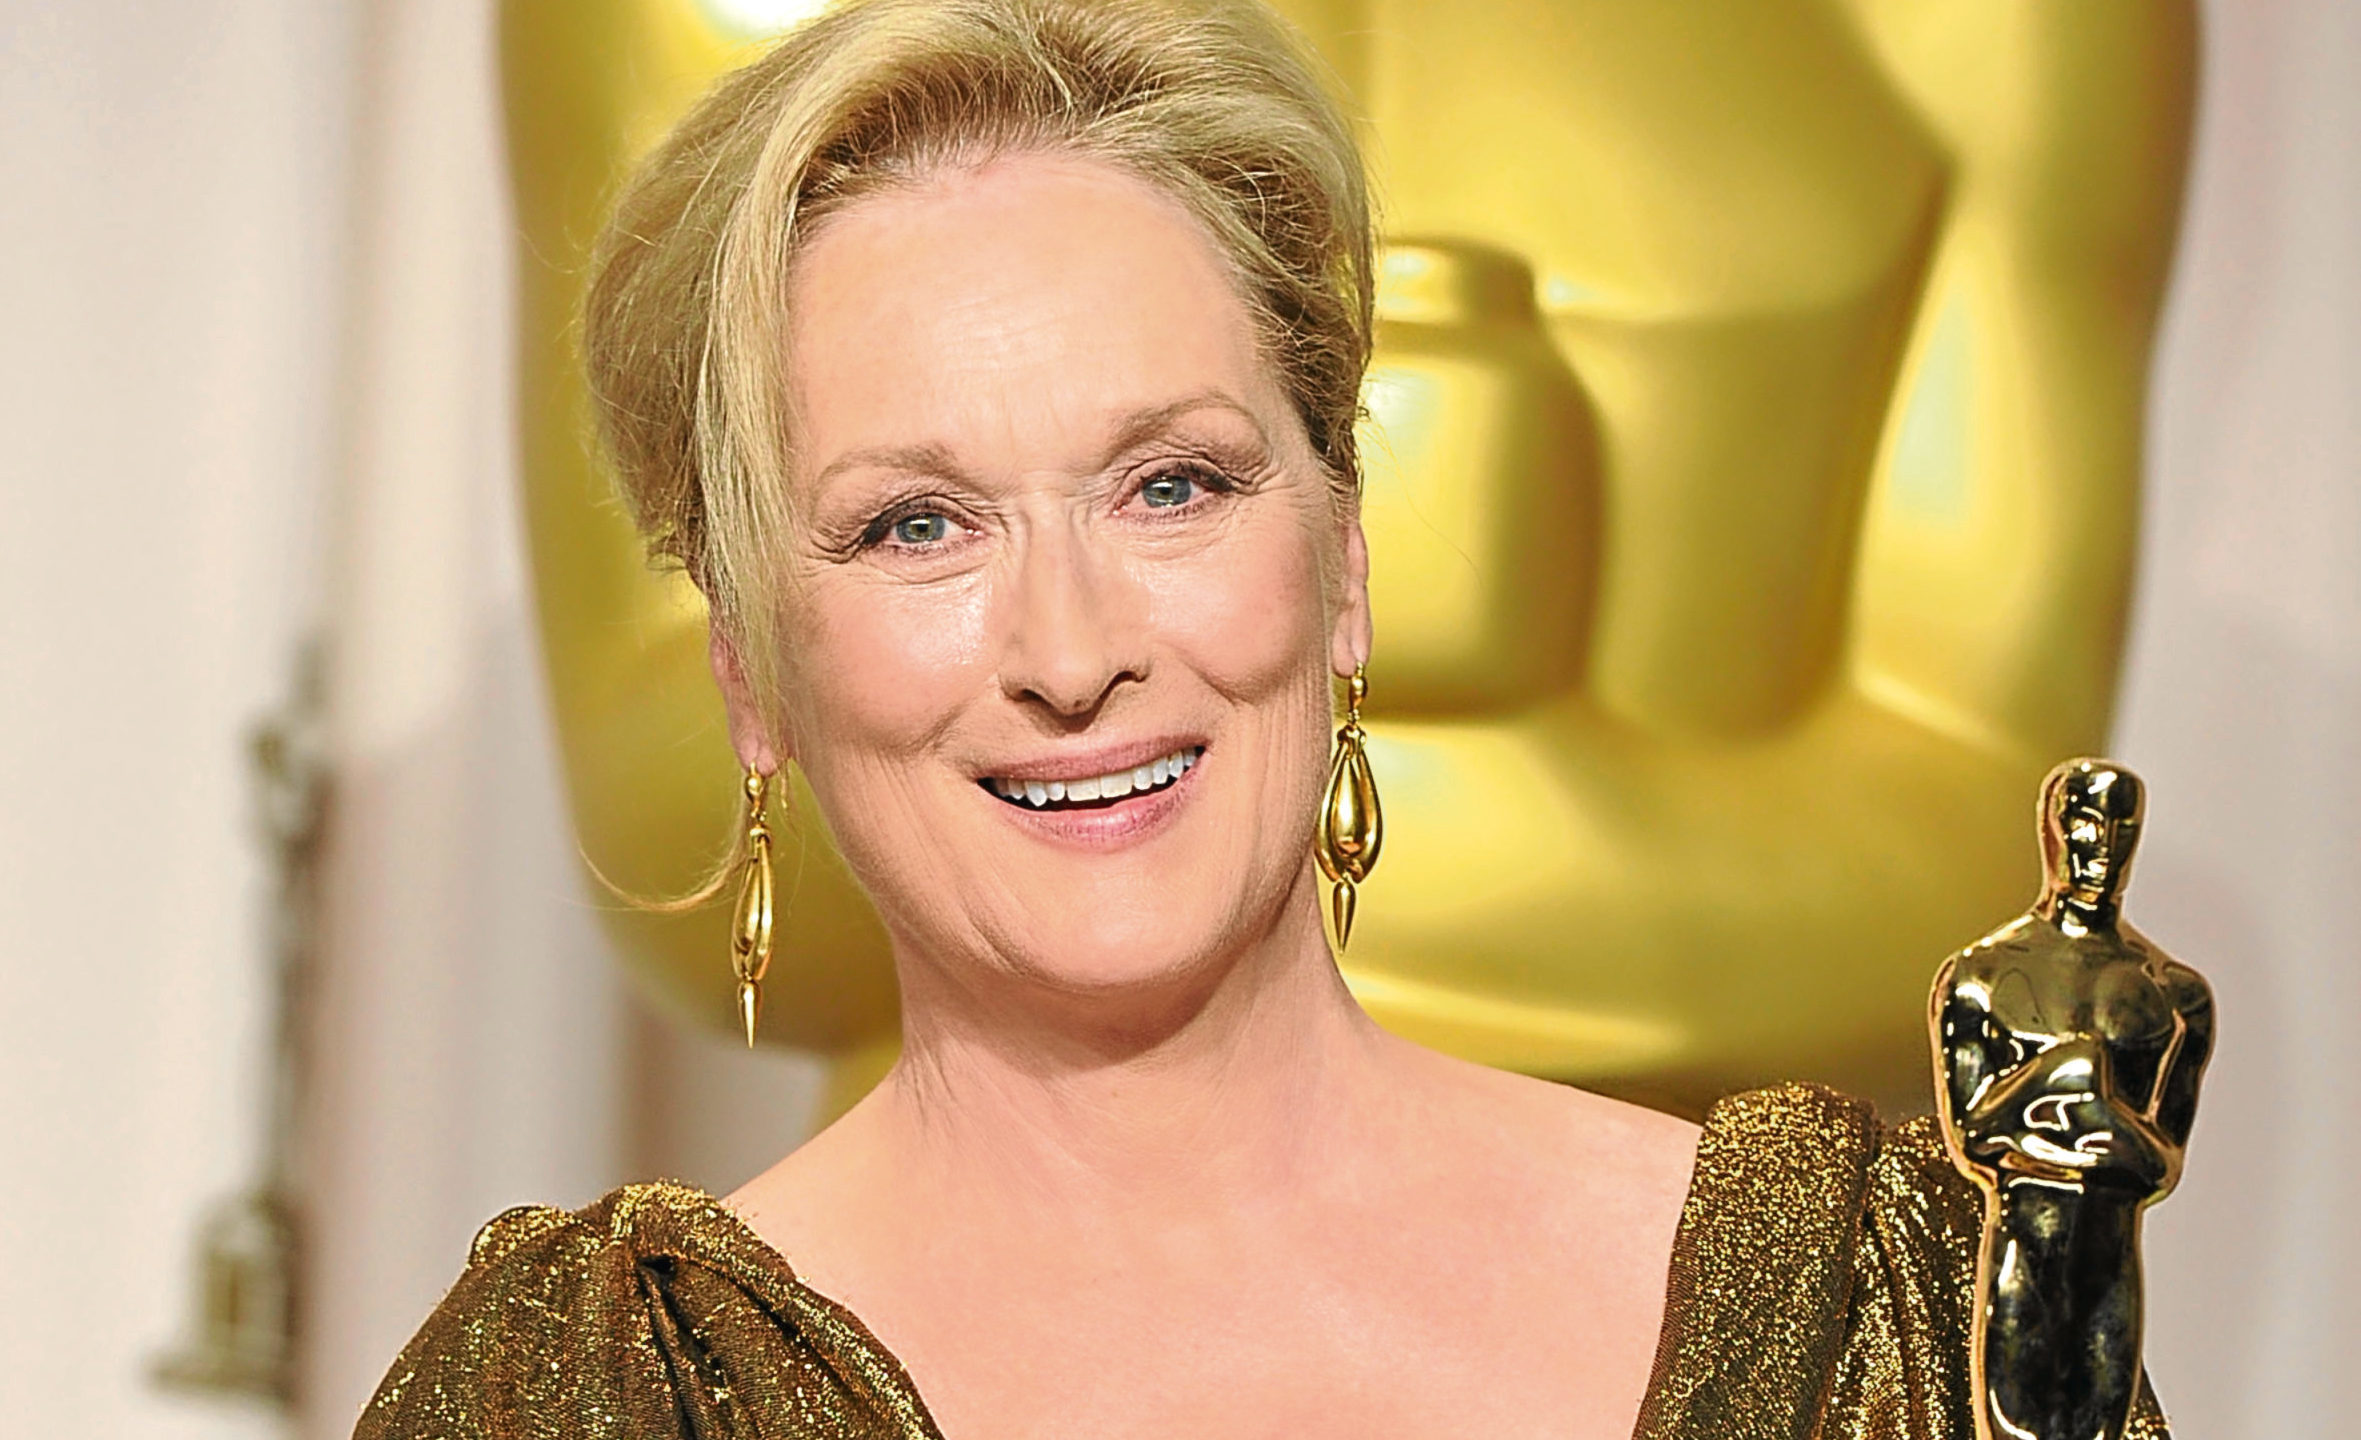 Meryl Streep has won three Oscars